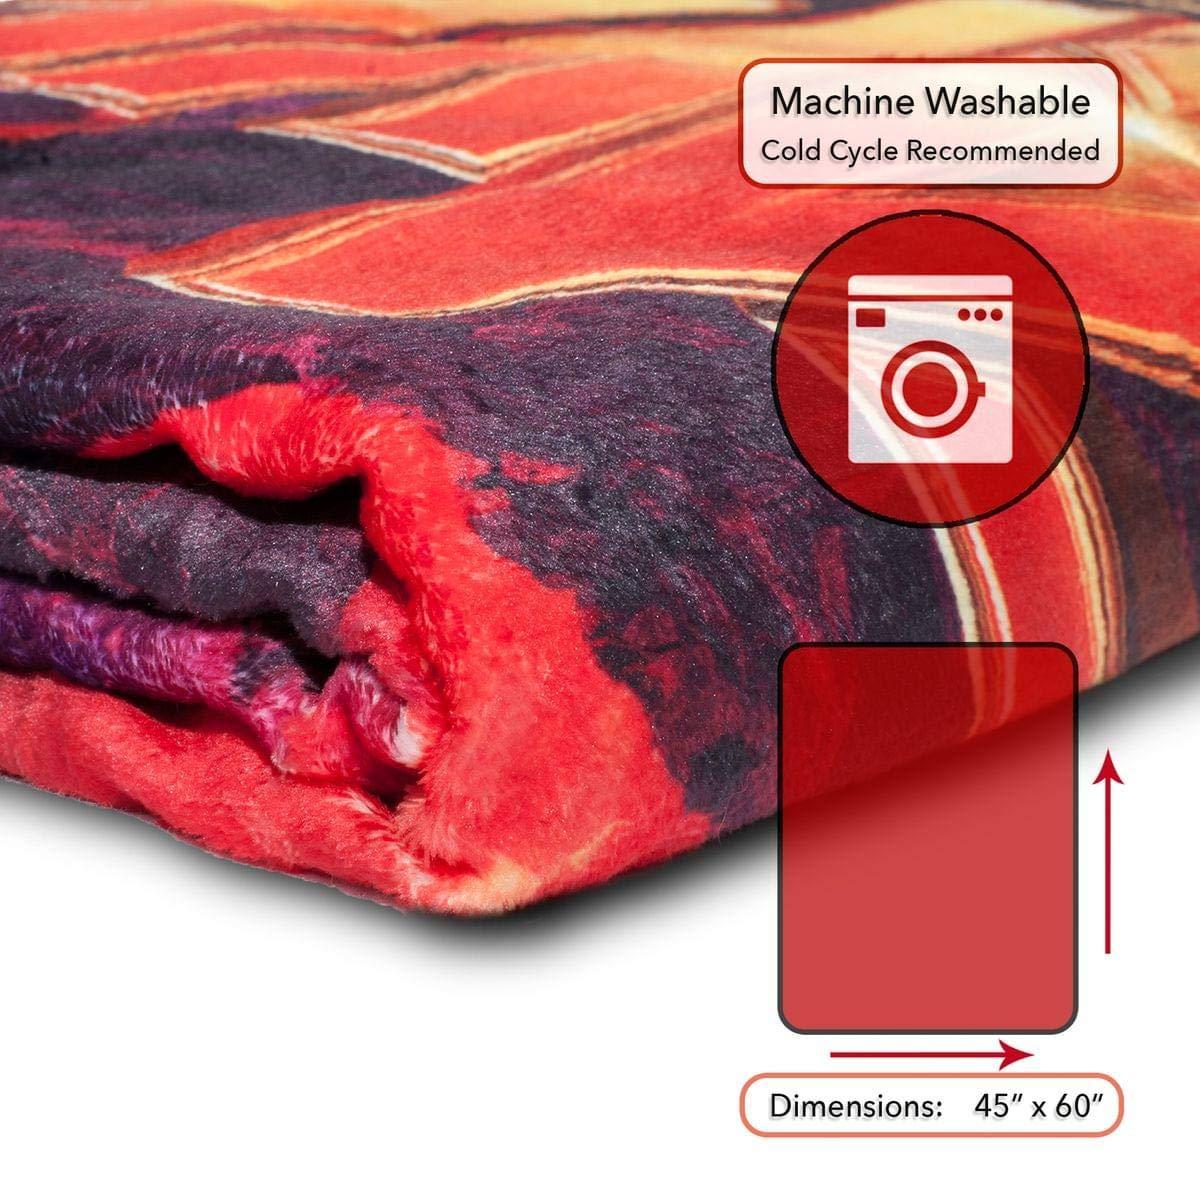 45x60 Inches Surreal Entertainment Licensed Merchandise Marvel Avengers Infinity War Fleece Blanket